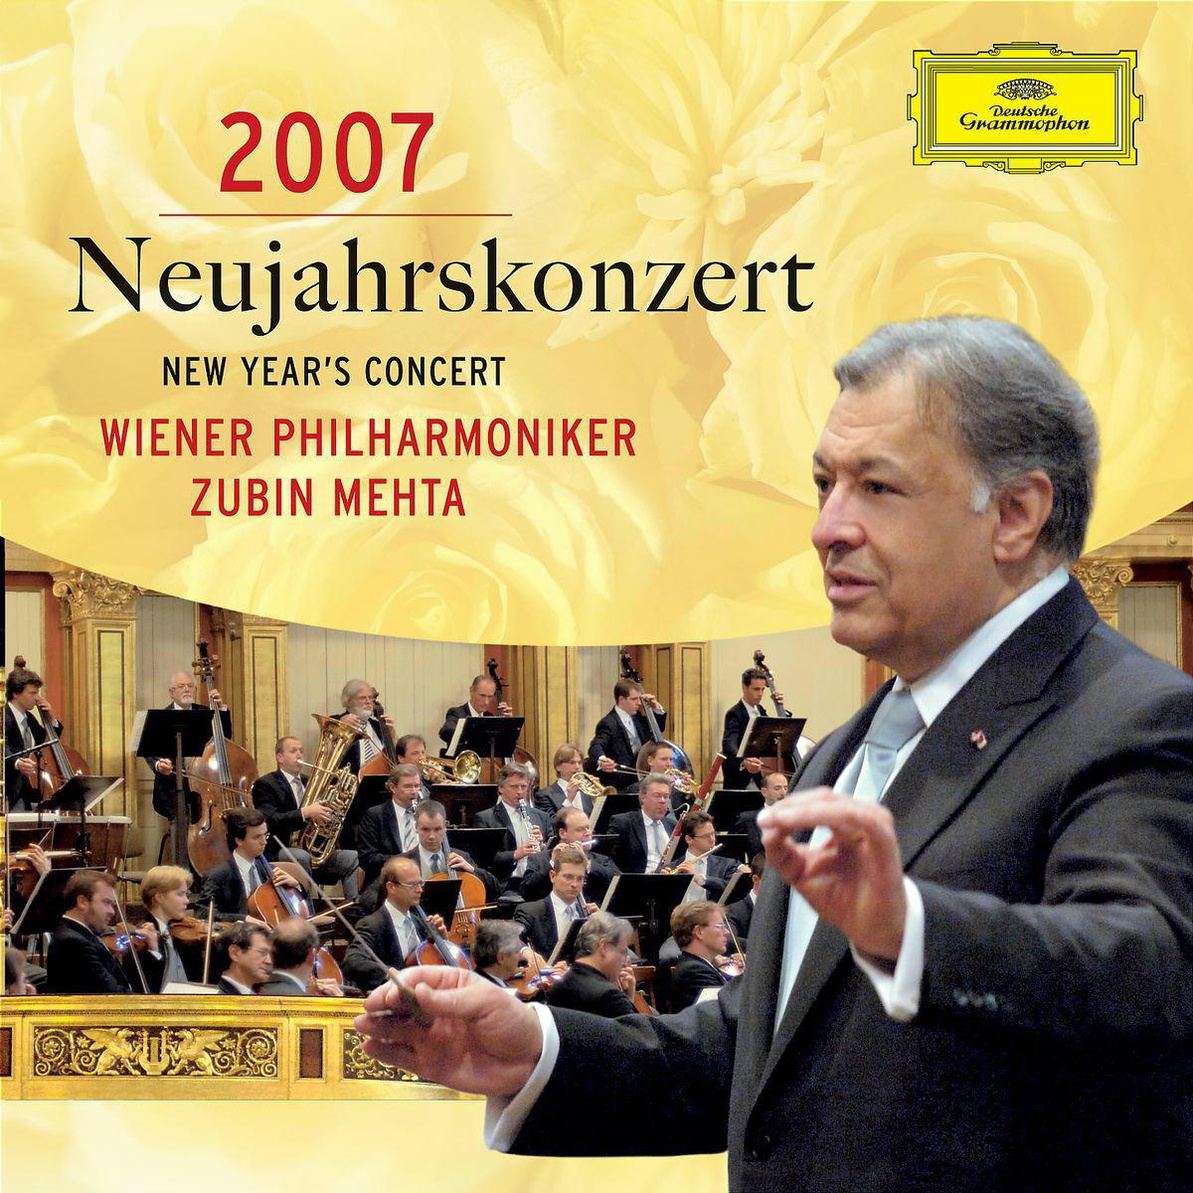 Zubin Mehta - Neujahrskonzert 2007